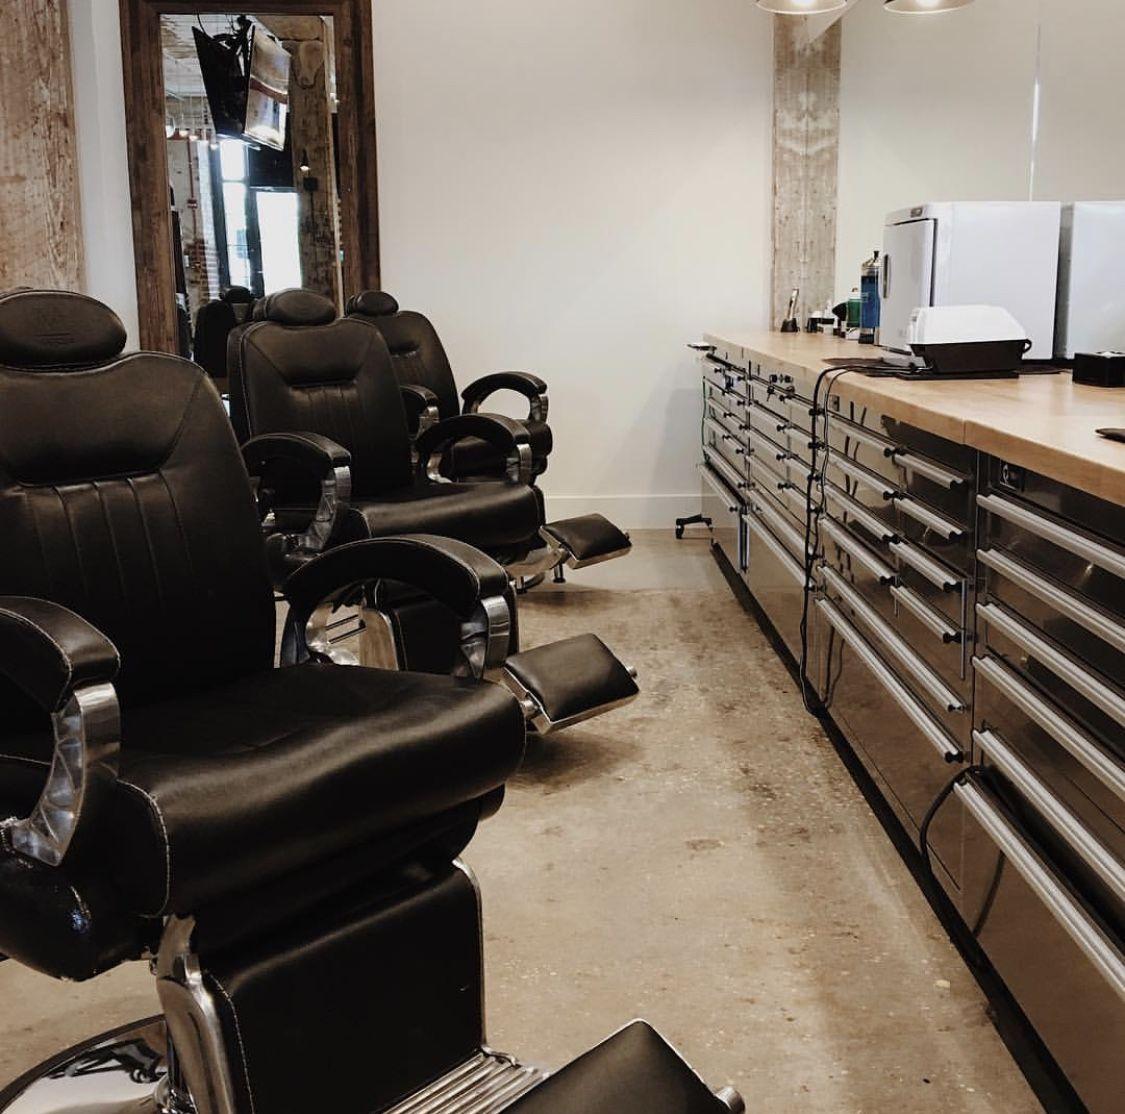 Peachy Spotted Figaro Barber Chairs At Barrelli Barber In Interior Design Ideas Grebswwsoteloinfo